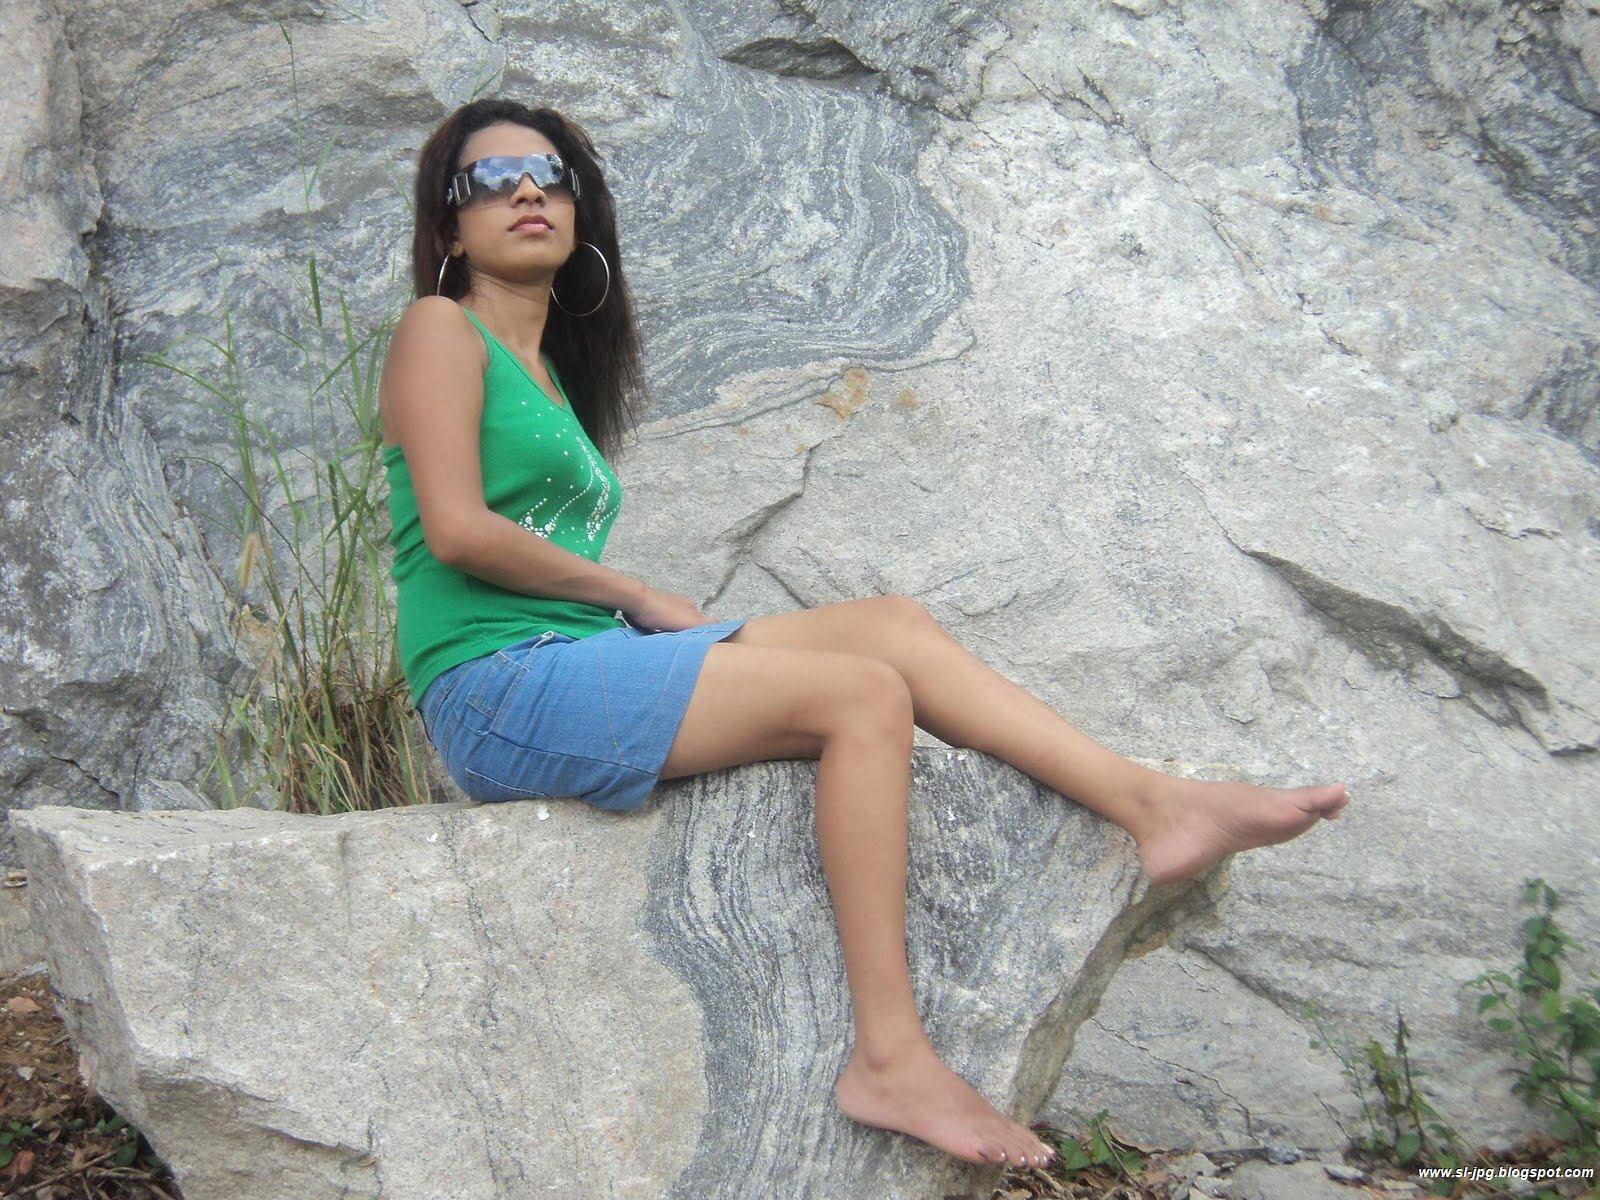 Srilankan Actress Sri Lanka Model Aloka Weerasinghe Hot -7197